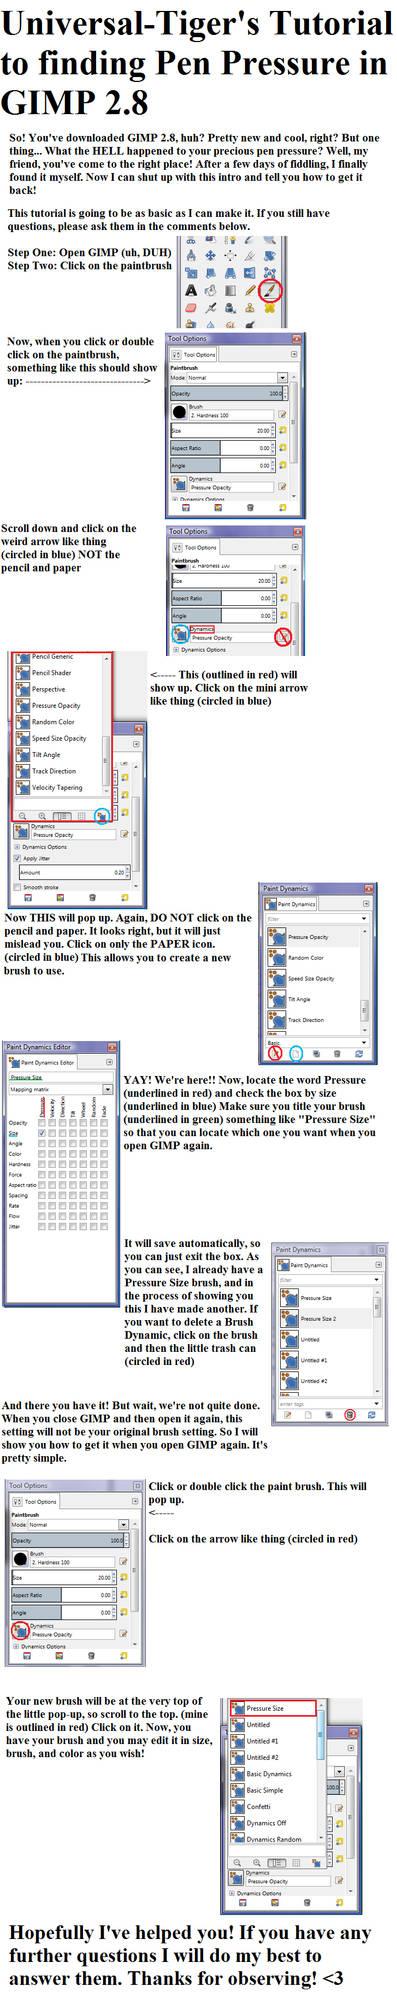 GIMP 2 8 Pen Pressure Help by Universal-Tiger on DeviantArt